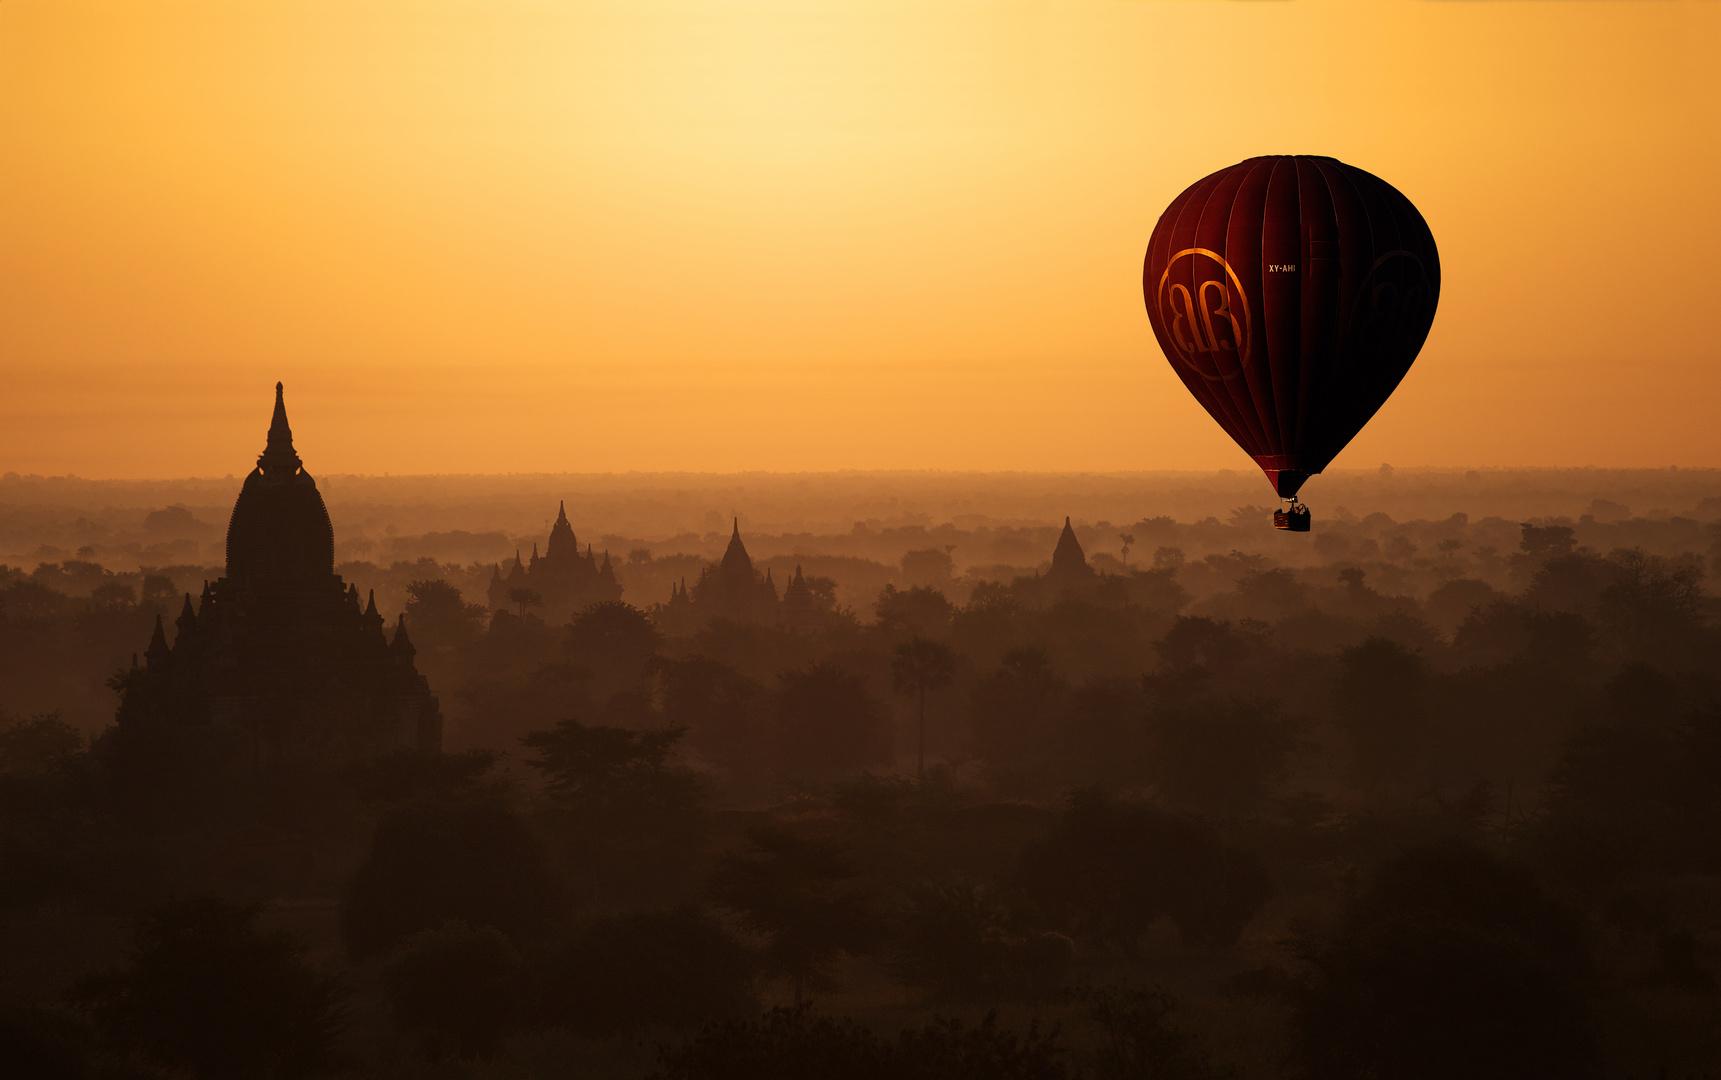 Balloon Over Bagan, Myanmar 2012